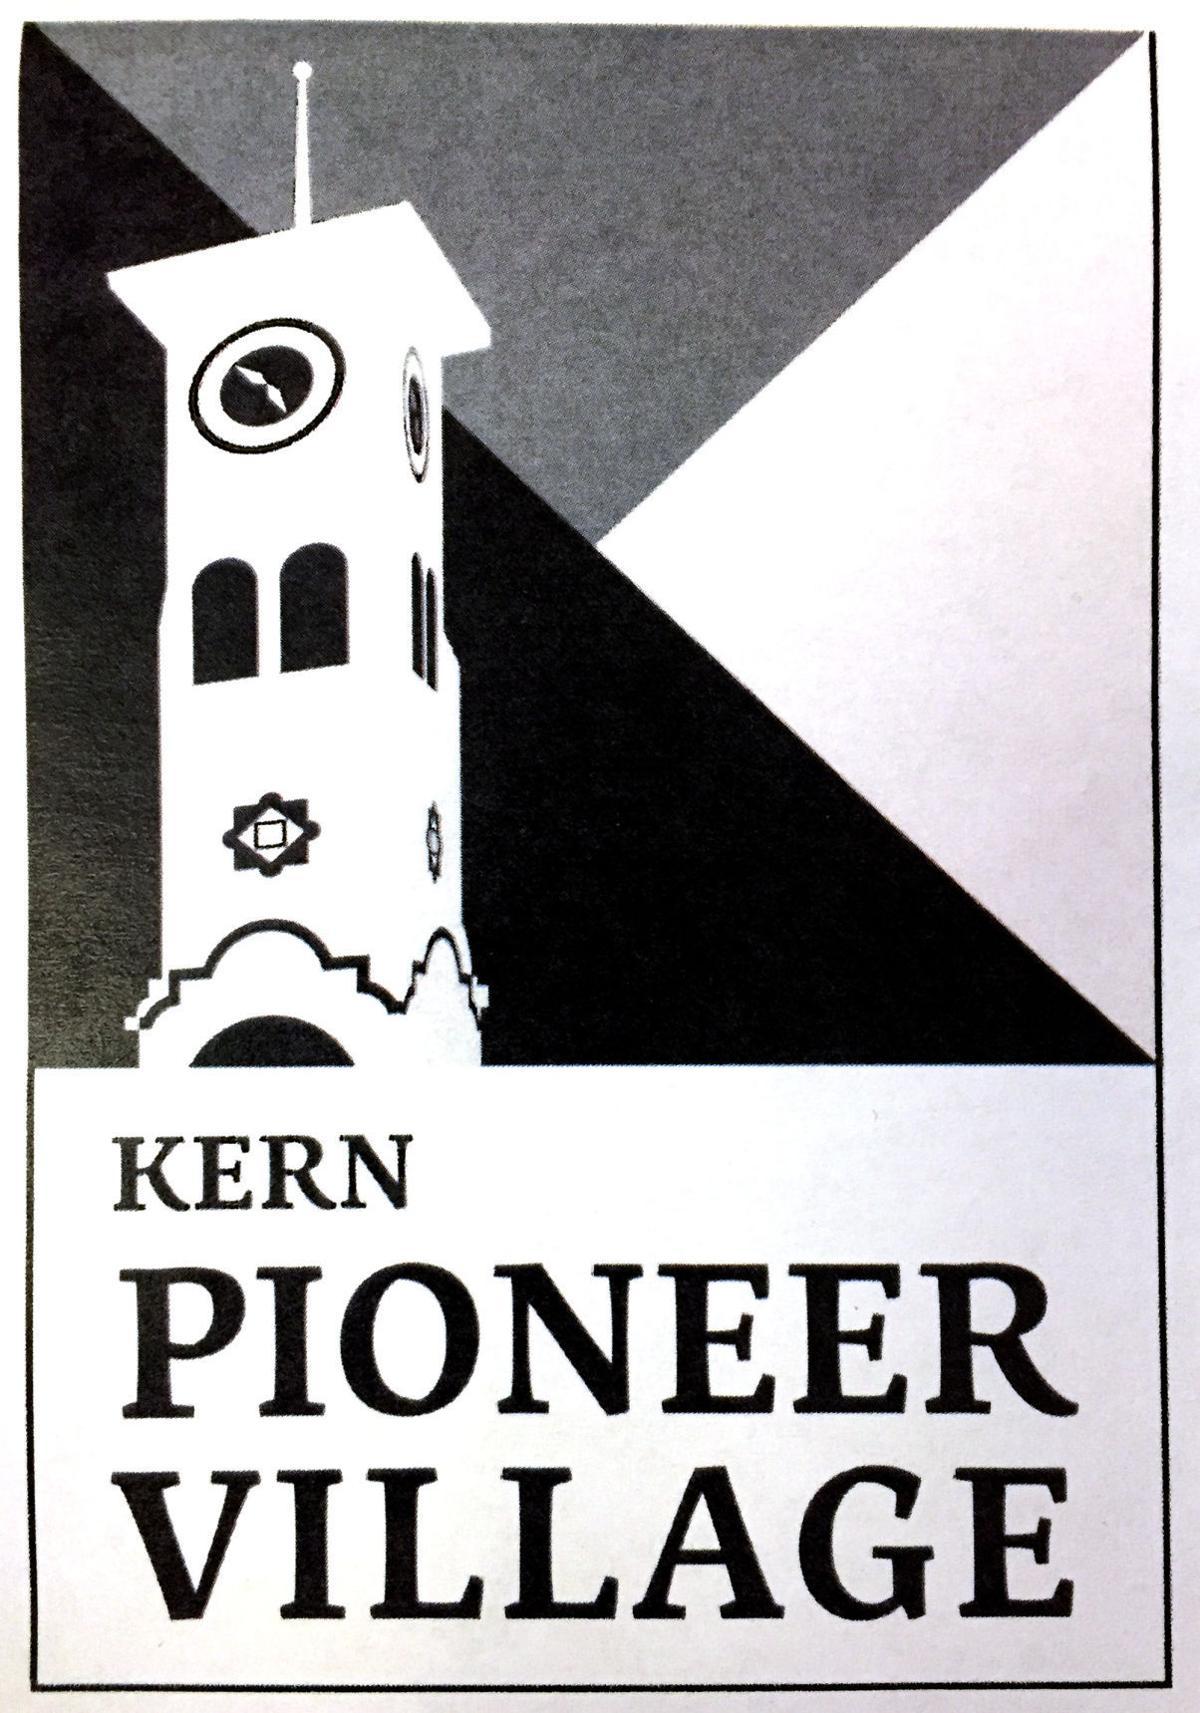 Museum logo: You wanted the clocktower, you've got the clocktower